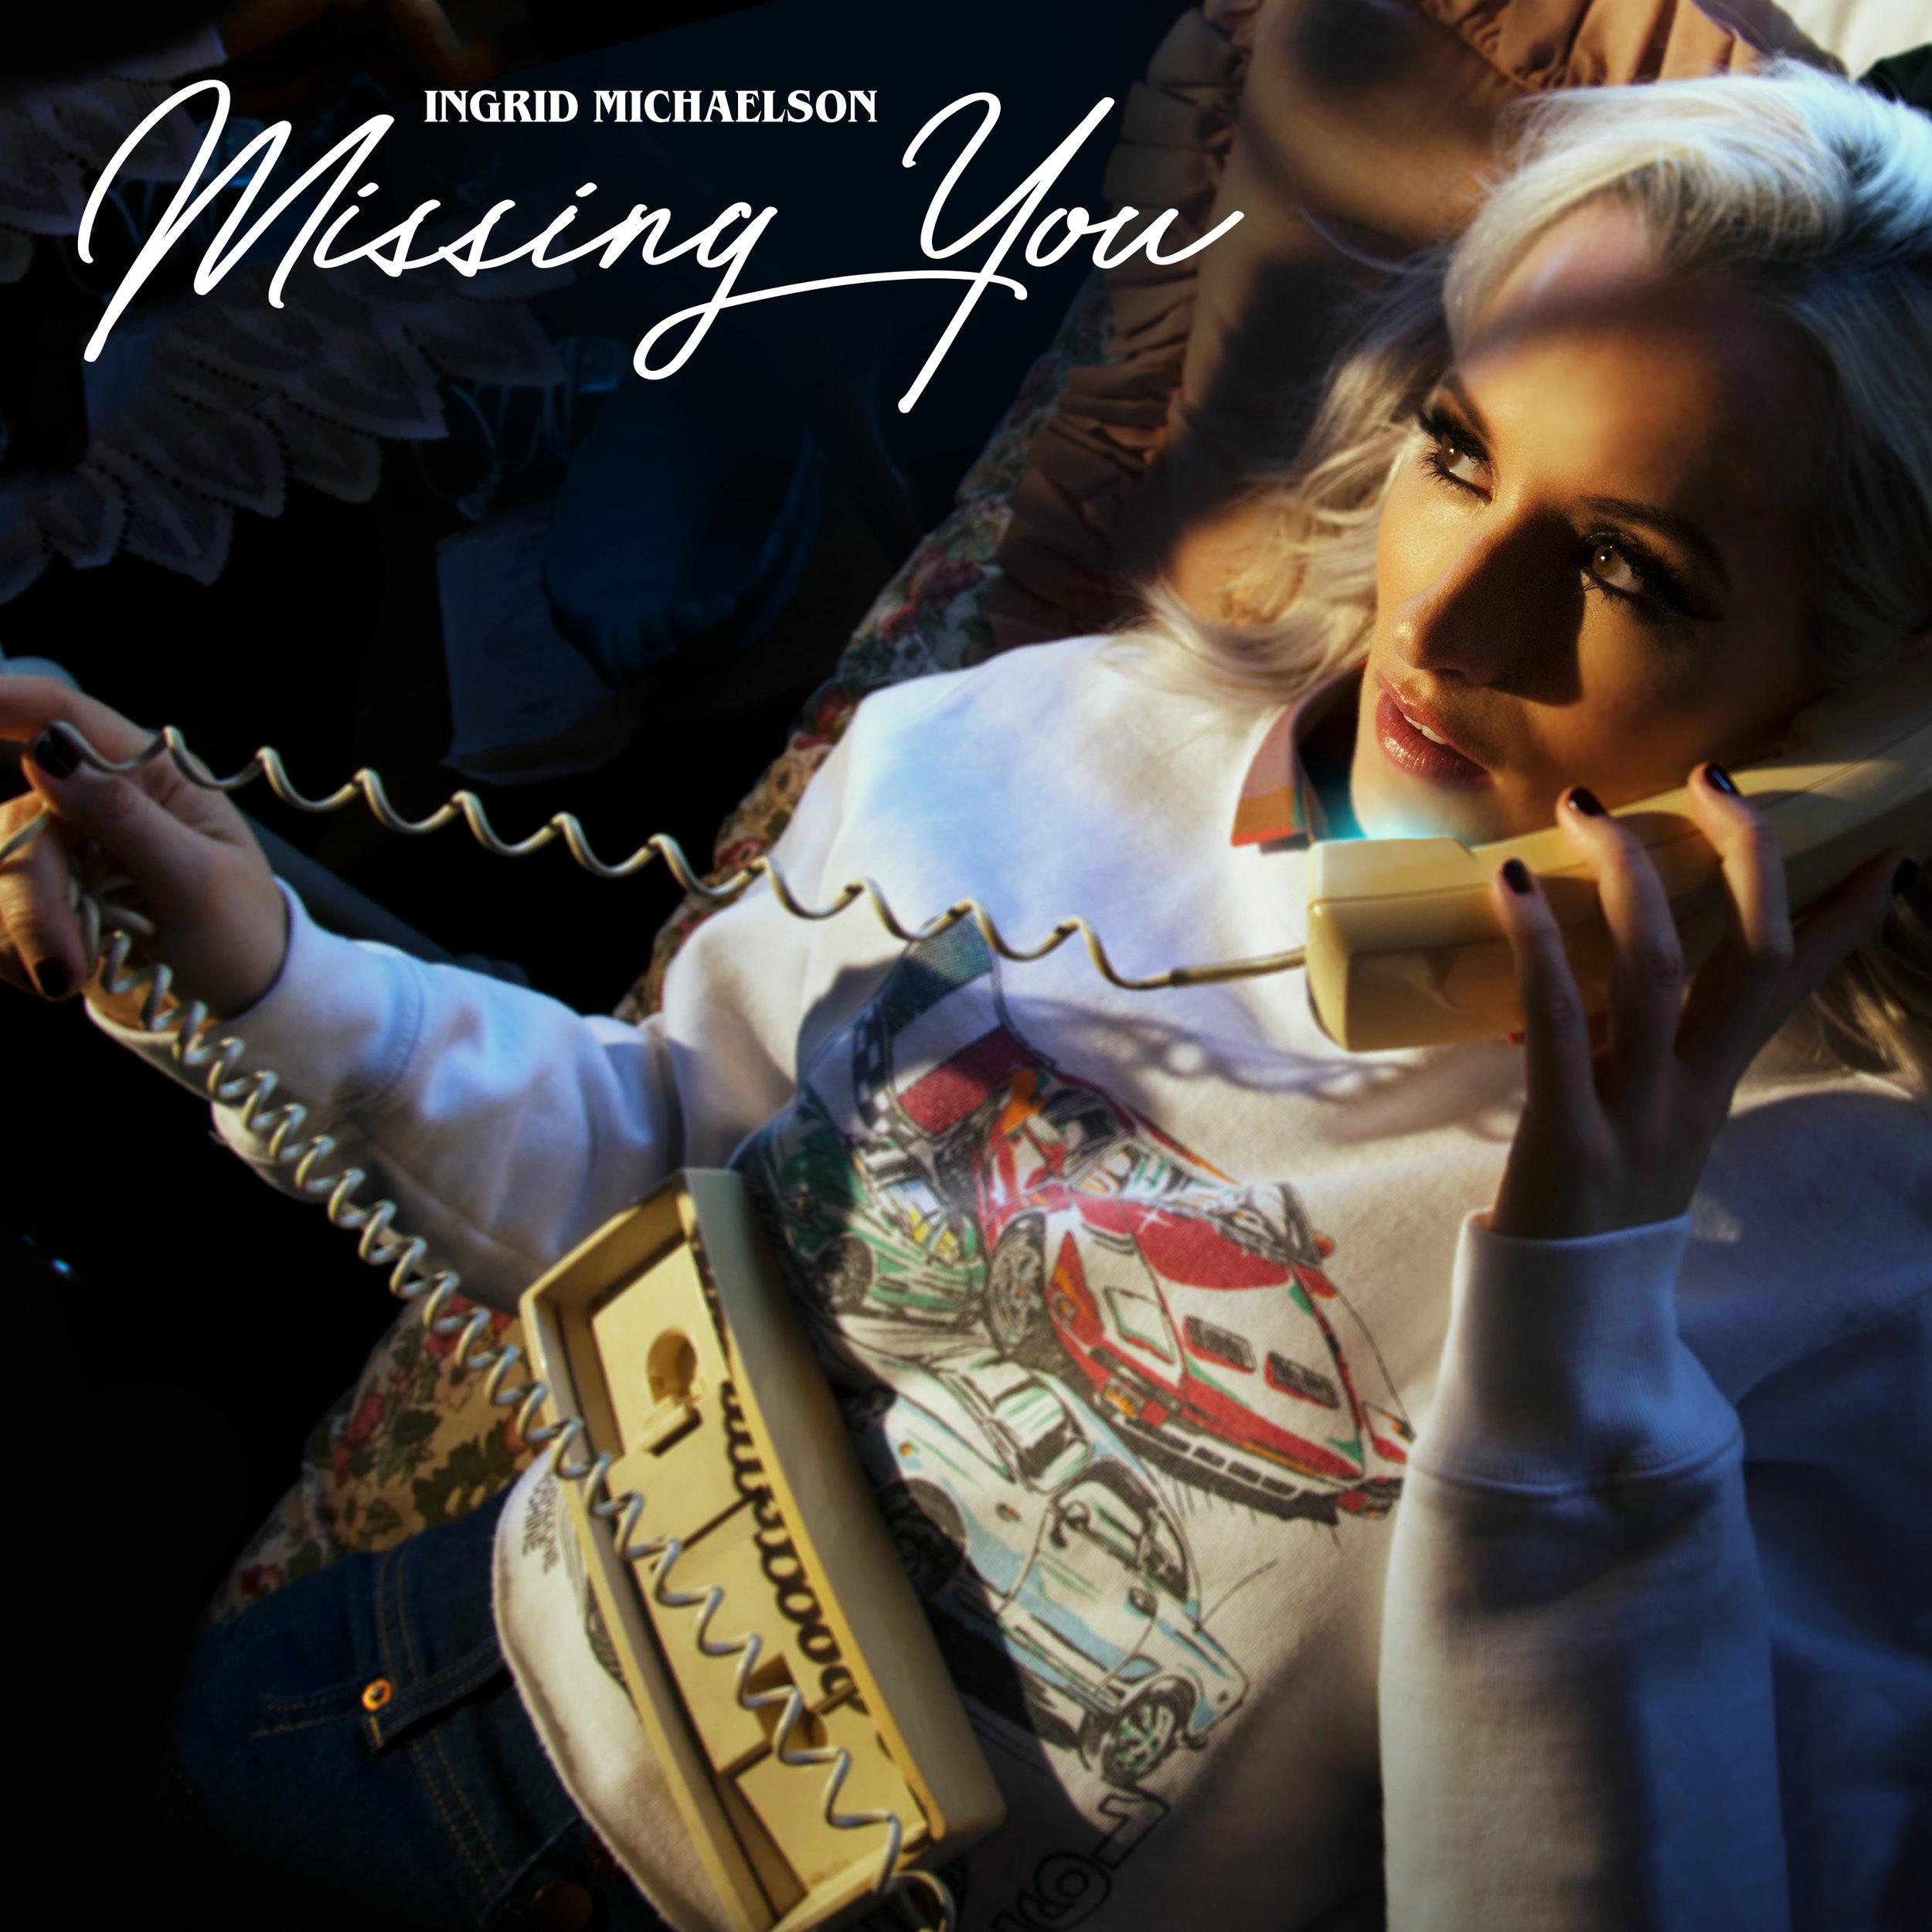 Ingrid-Michaelson-Missing-You.jpg